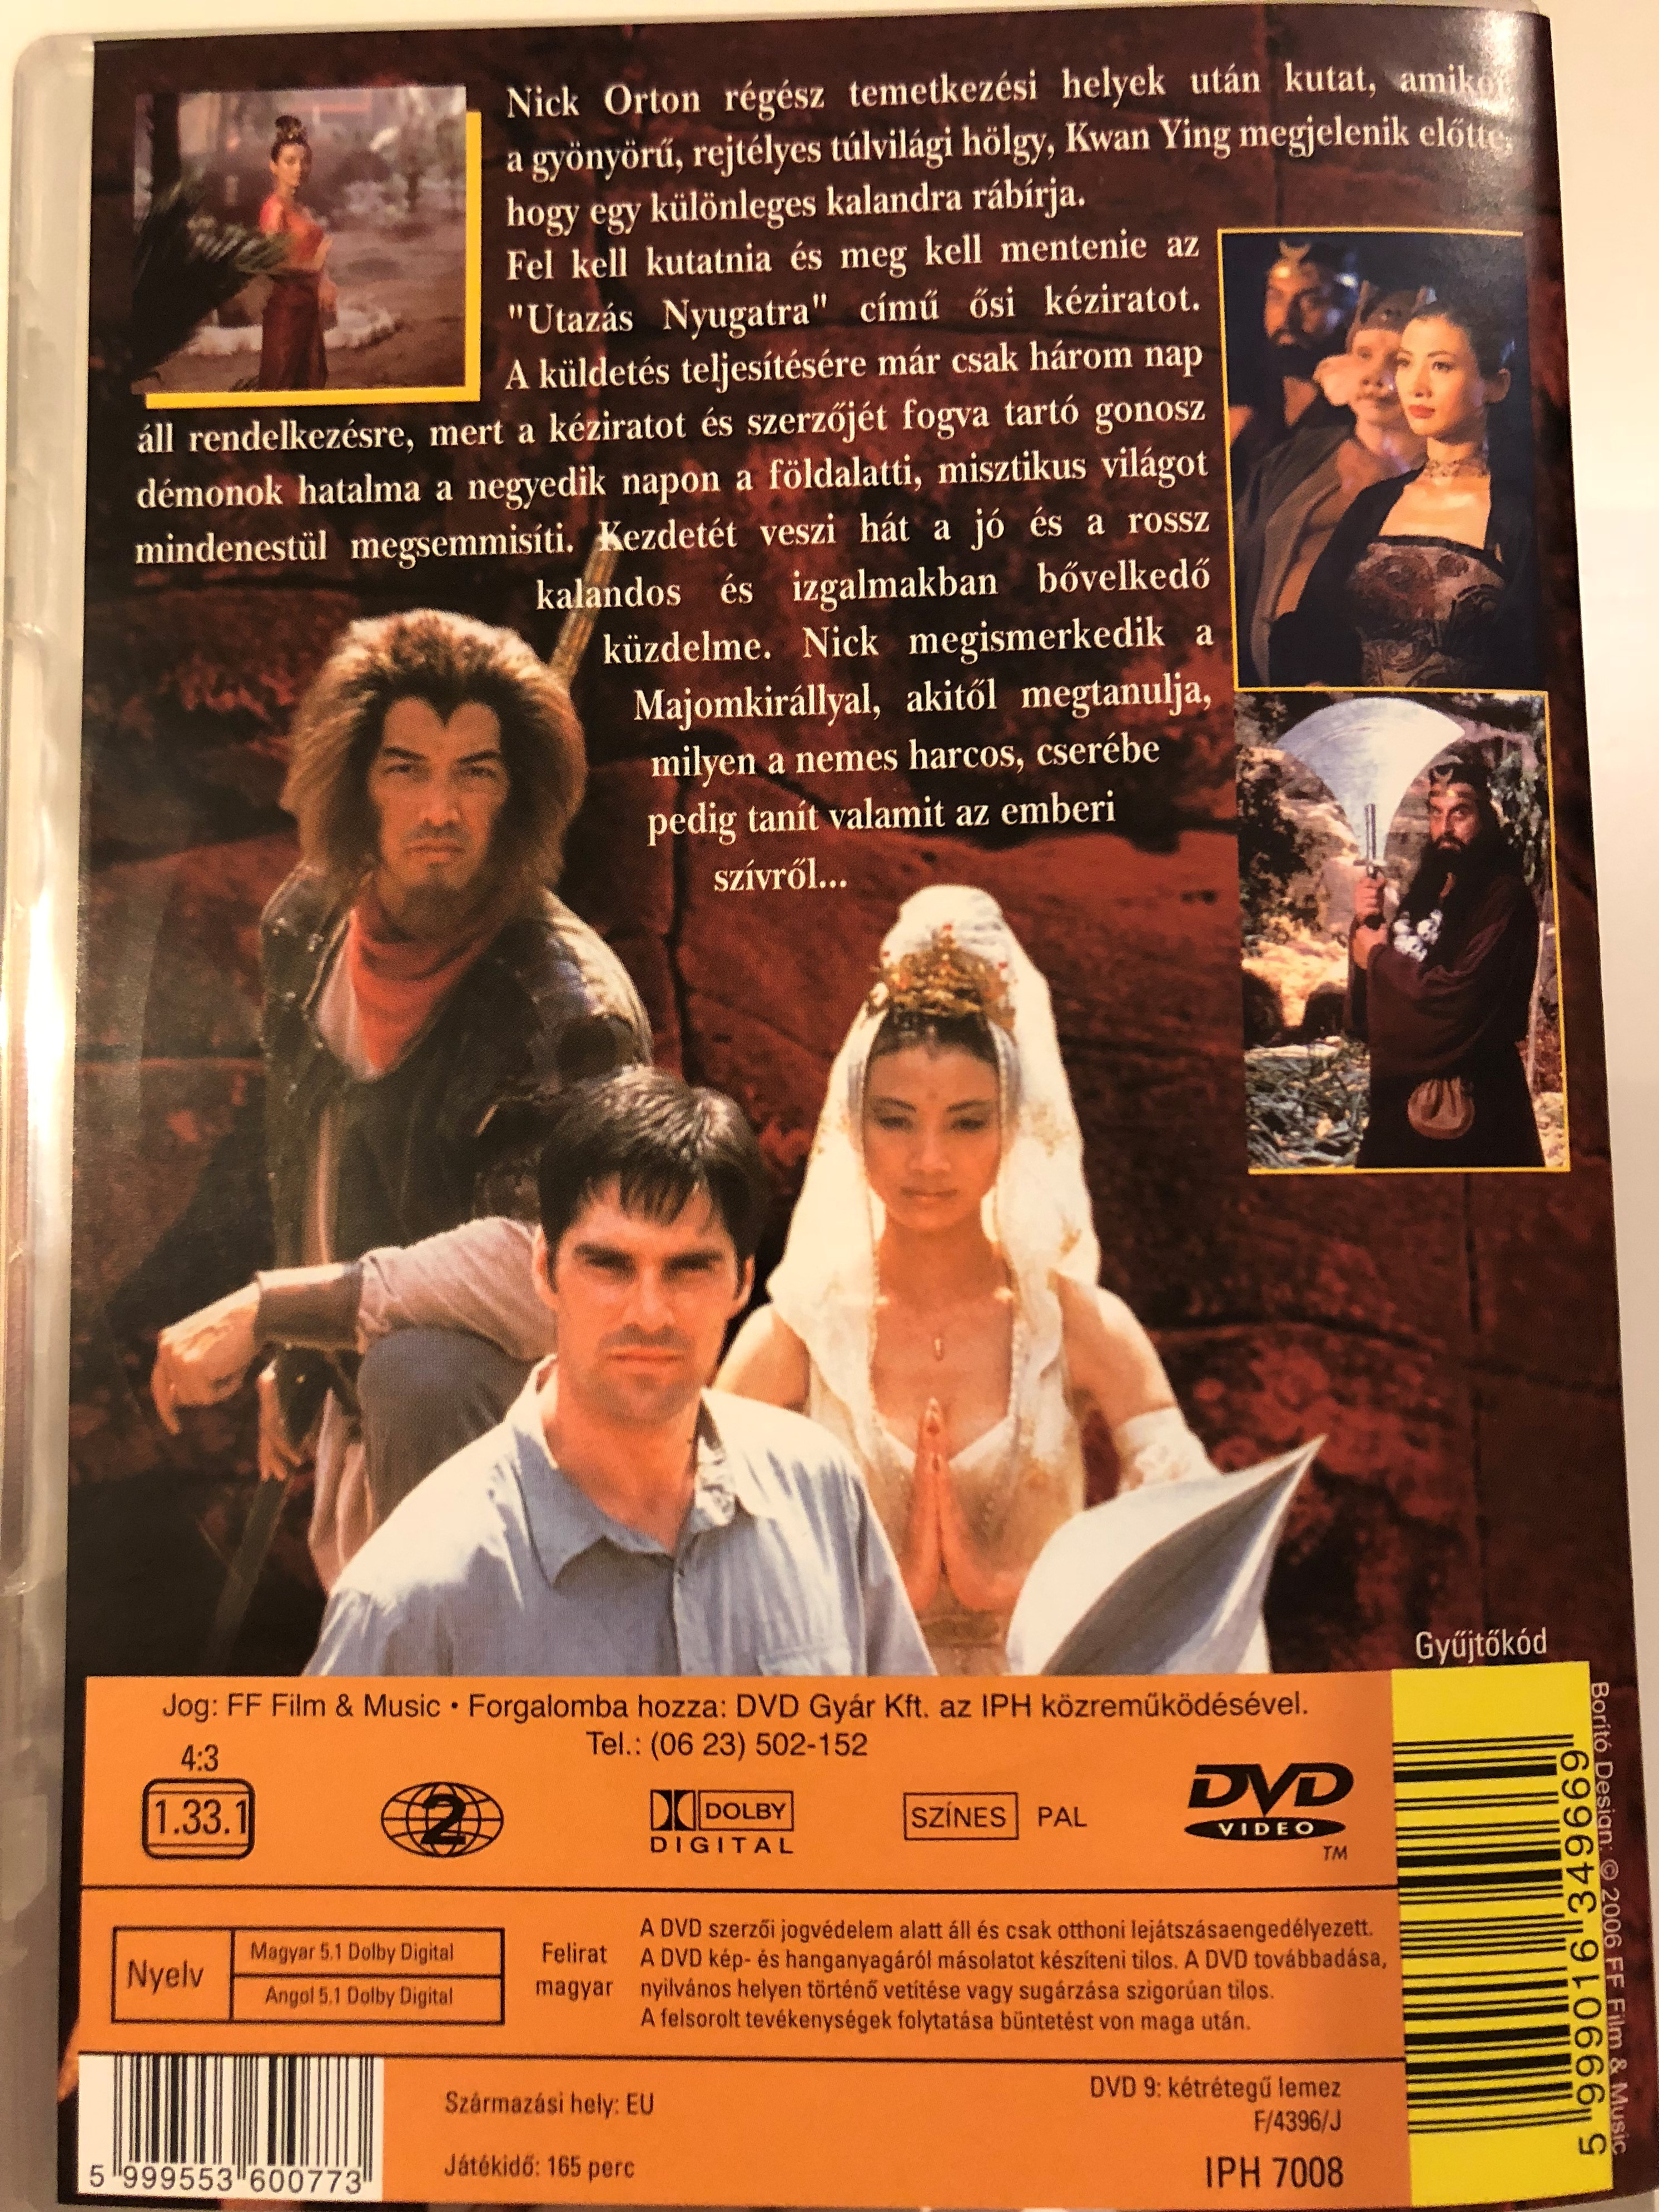 the-lost-empire-dvd-2001-a-s-rk-ny-ve-az-elveszett-birodalom-the-monkey-king-directed-by-peter-macdonald-starring-thomas-gibson-bai-ling-russel-wong-2-.jpg